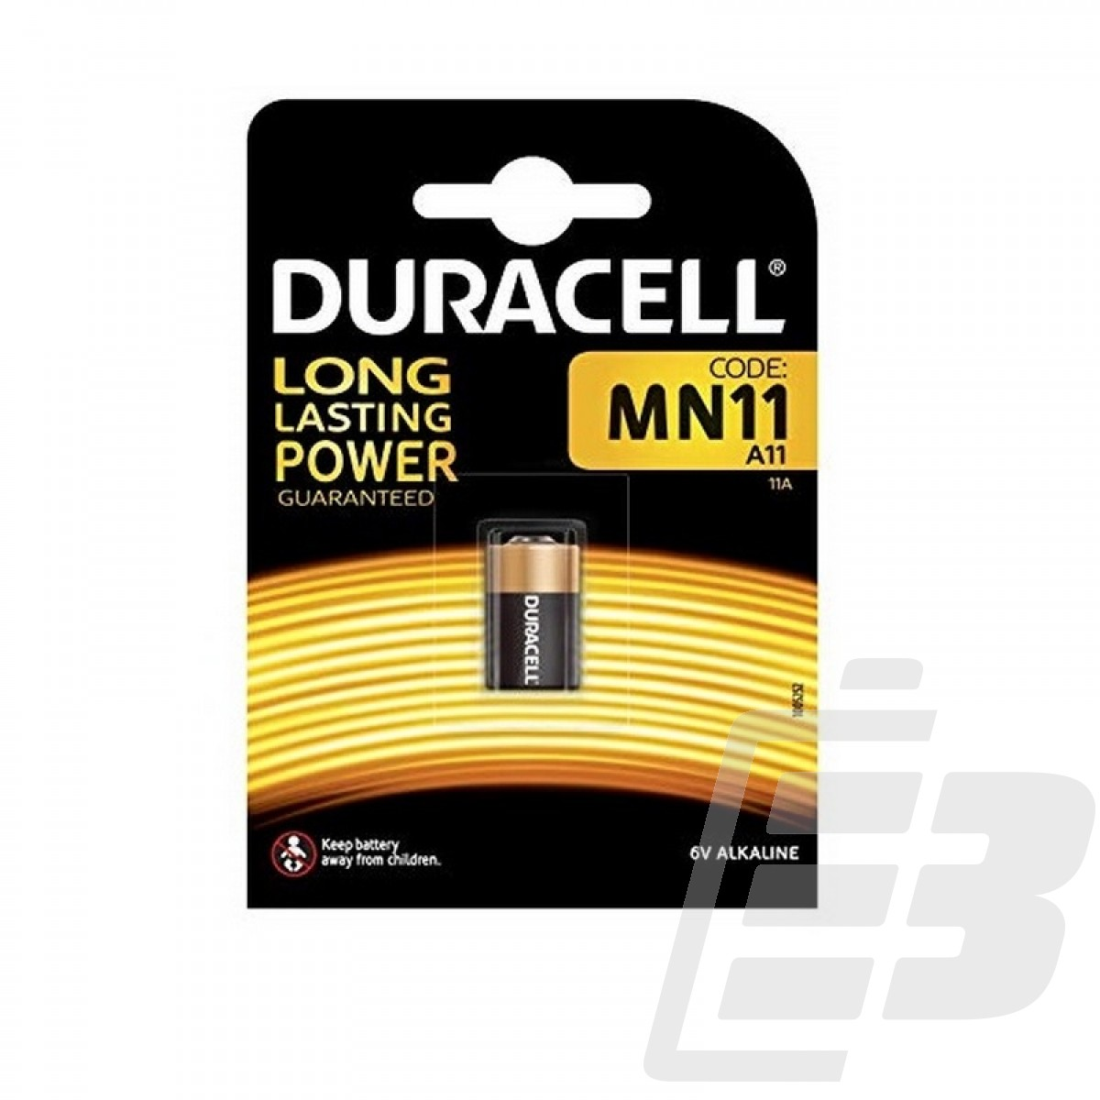 Duracell Plus MN11 Alkaline battery